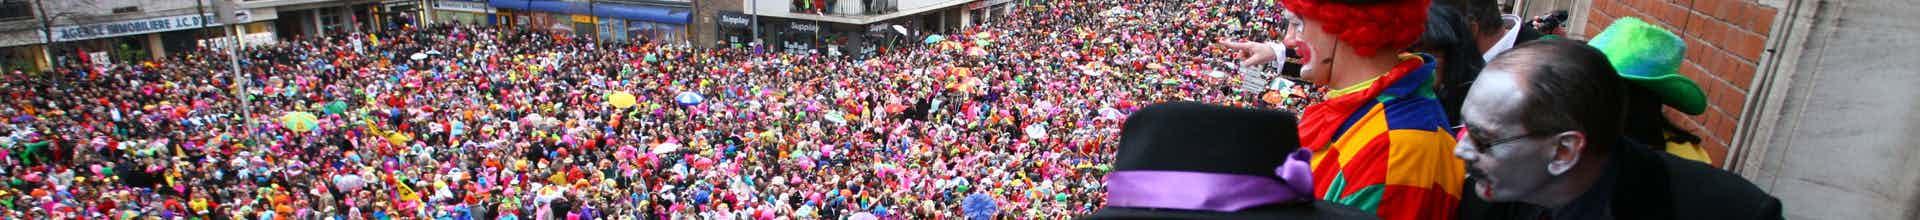 Maquillage carnaval de dunkerque et carnavaleux